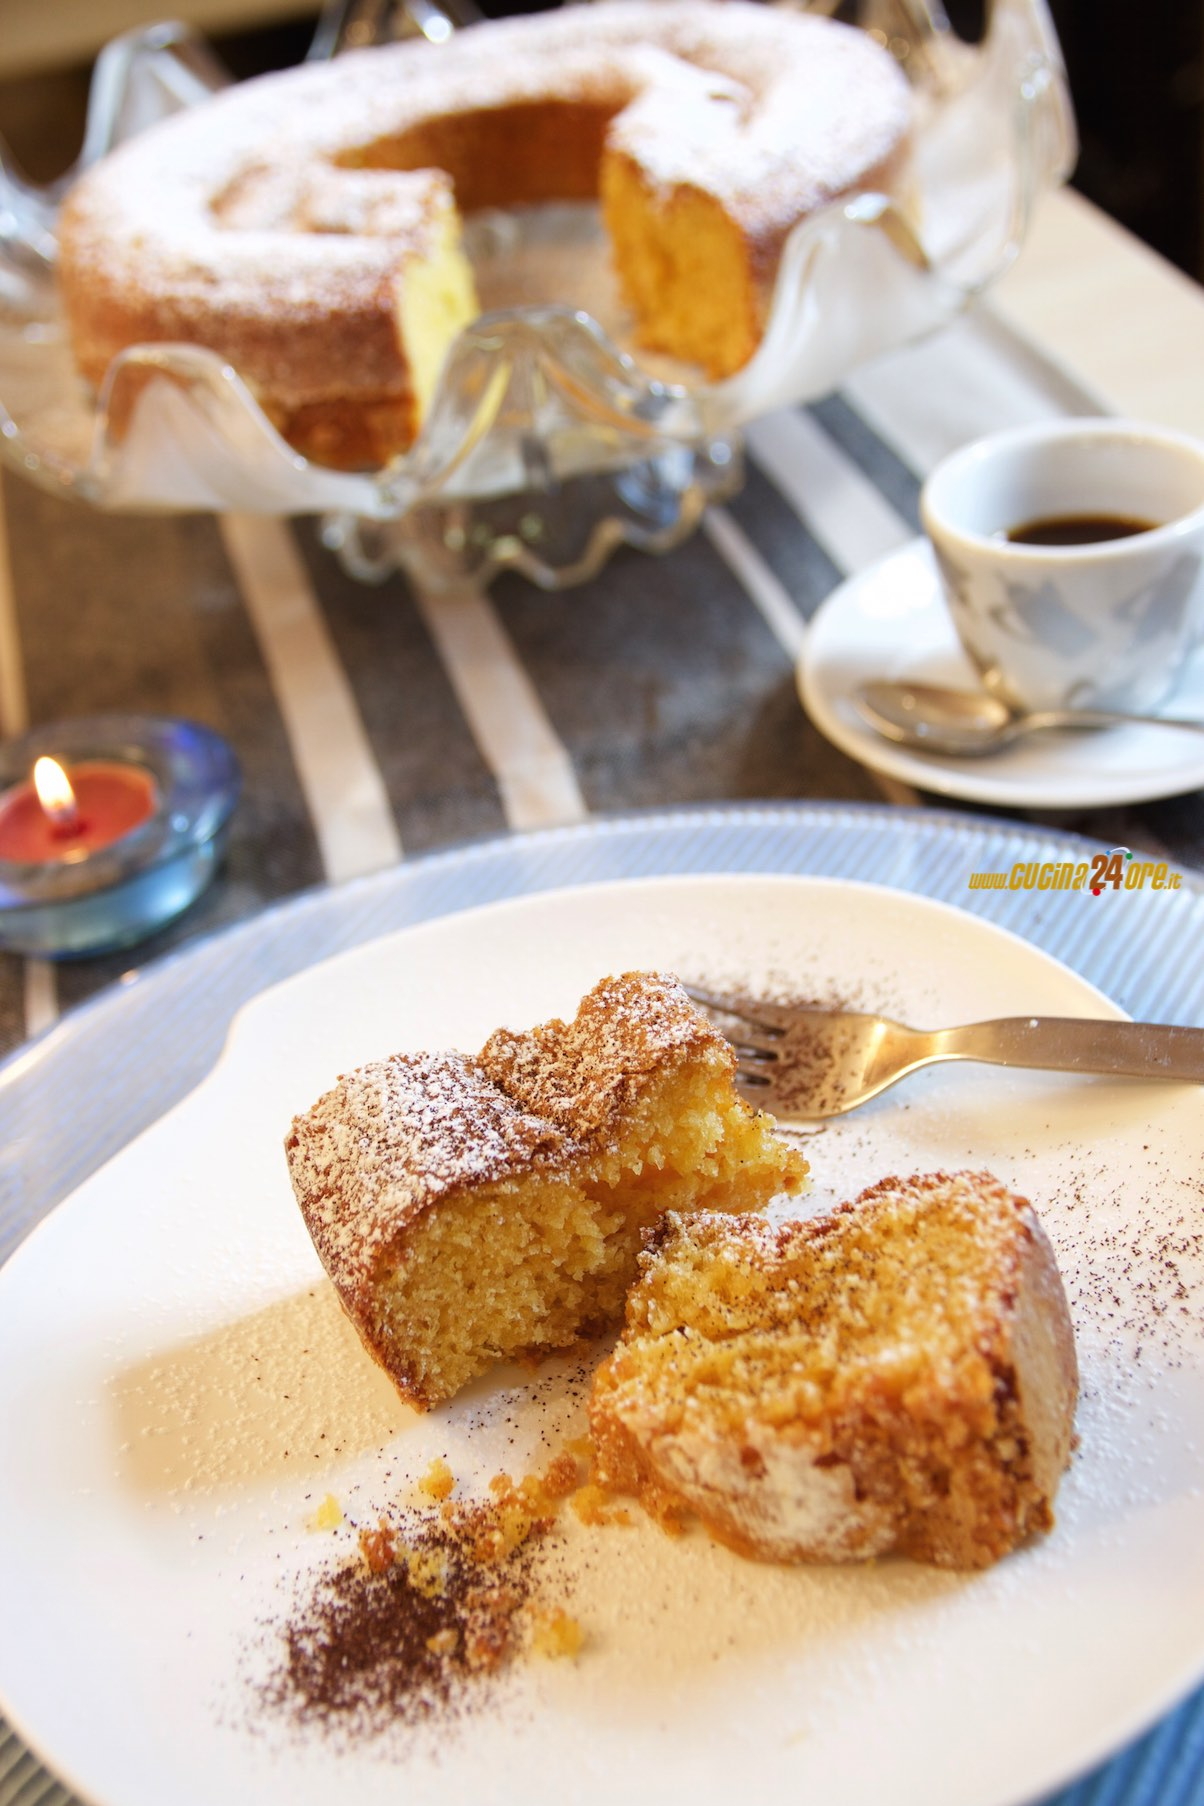 Ciambellone Senza Glutine Con Yogurt Al Caffè #A36928 1204 1806 Cucina Mediterranea Senza Glutine